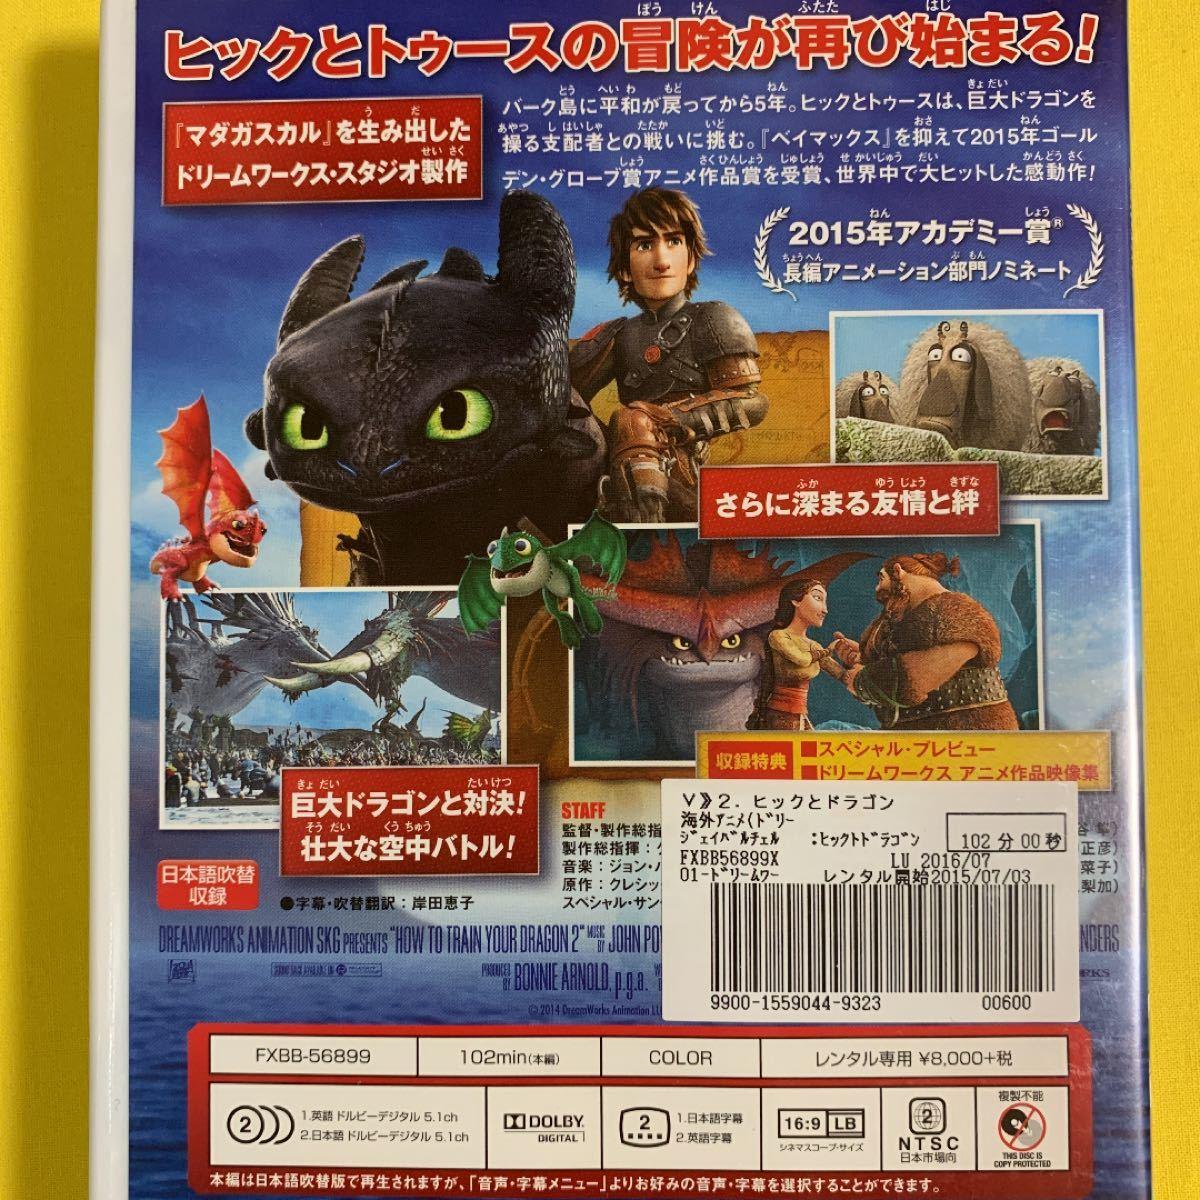 DVD ヒックとドラゴン 2巻セット レンタル落ち